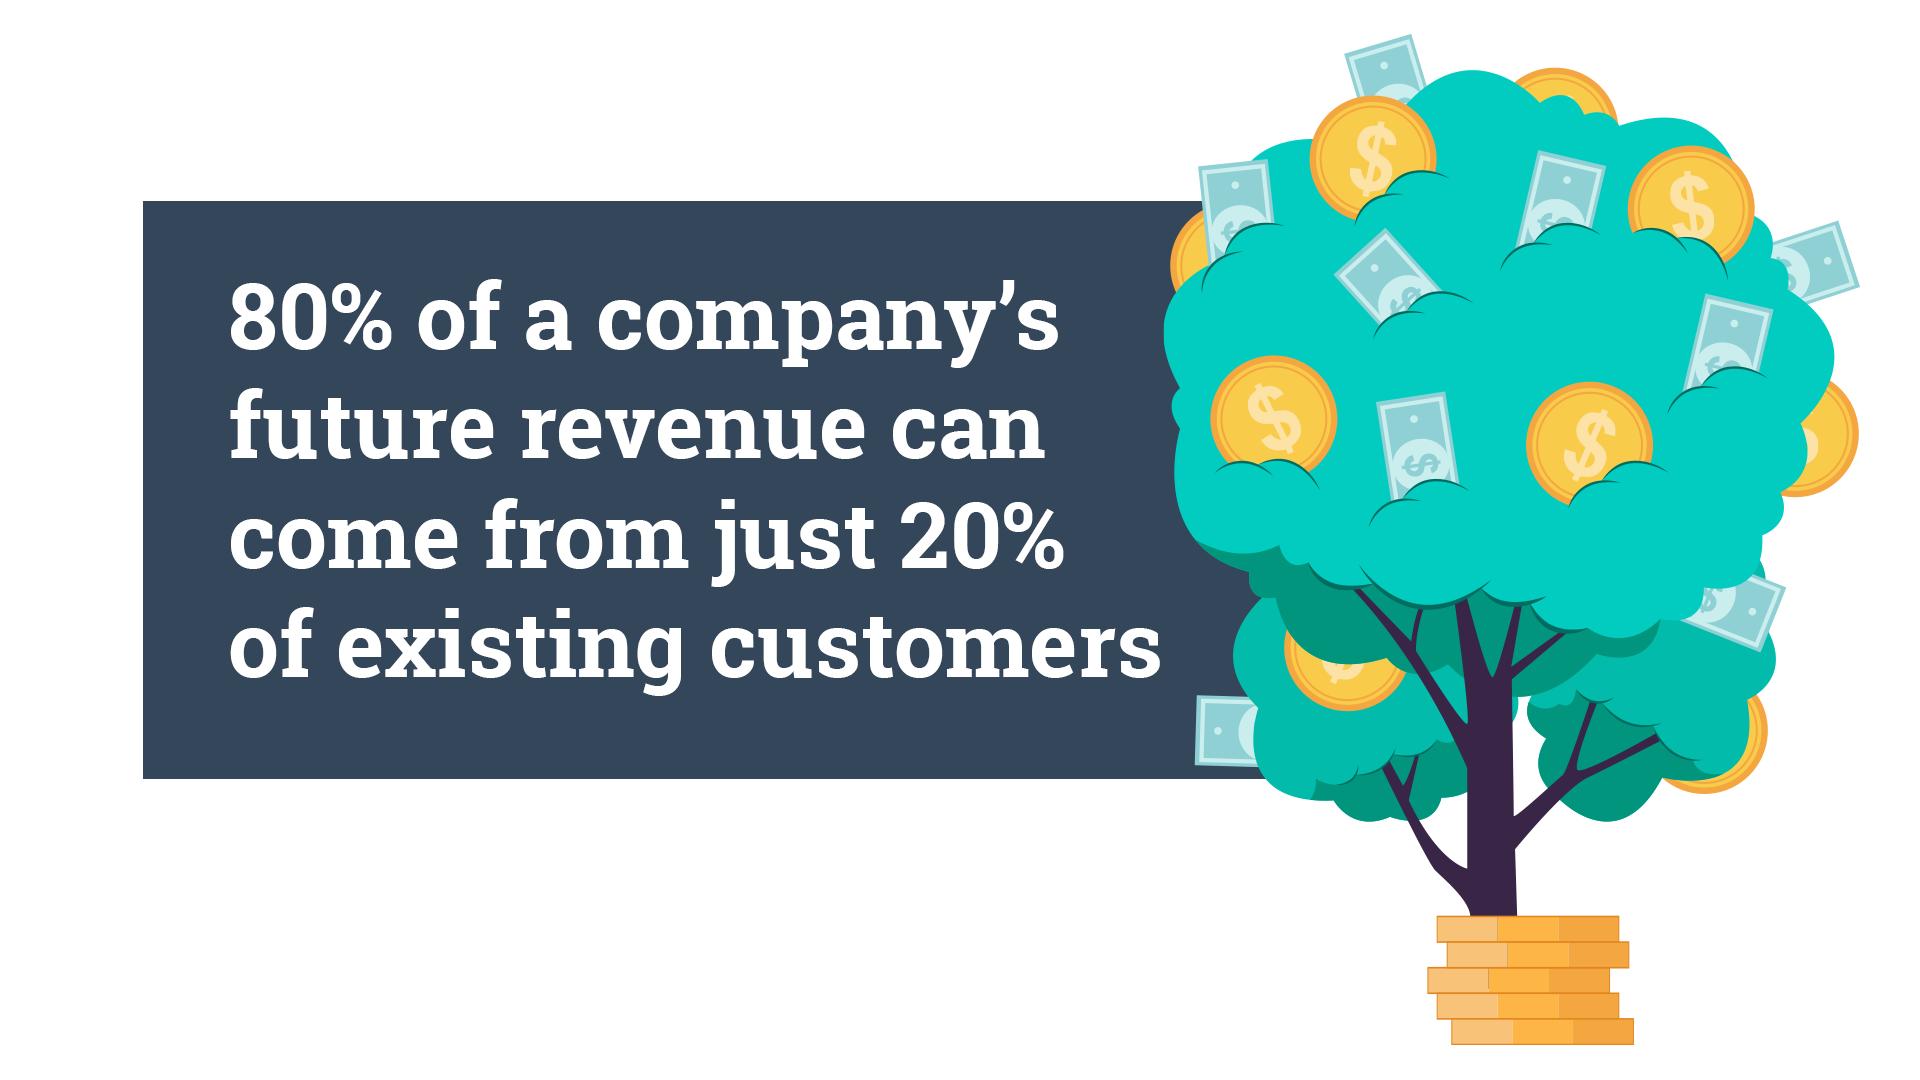 gartner statistic company revenue customer retention